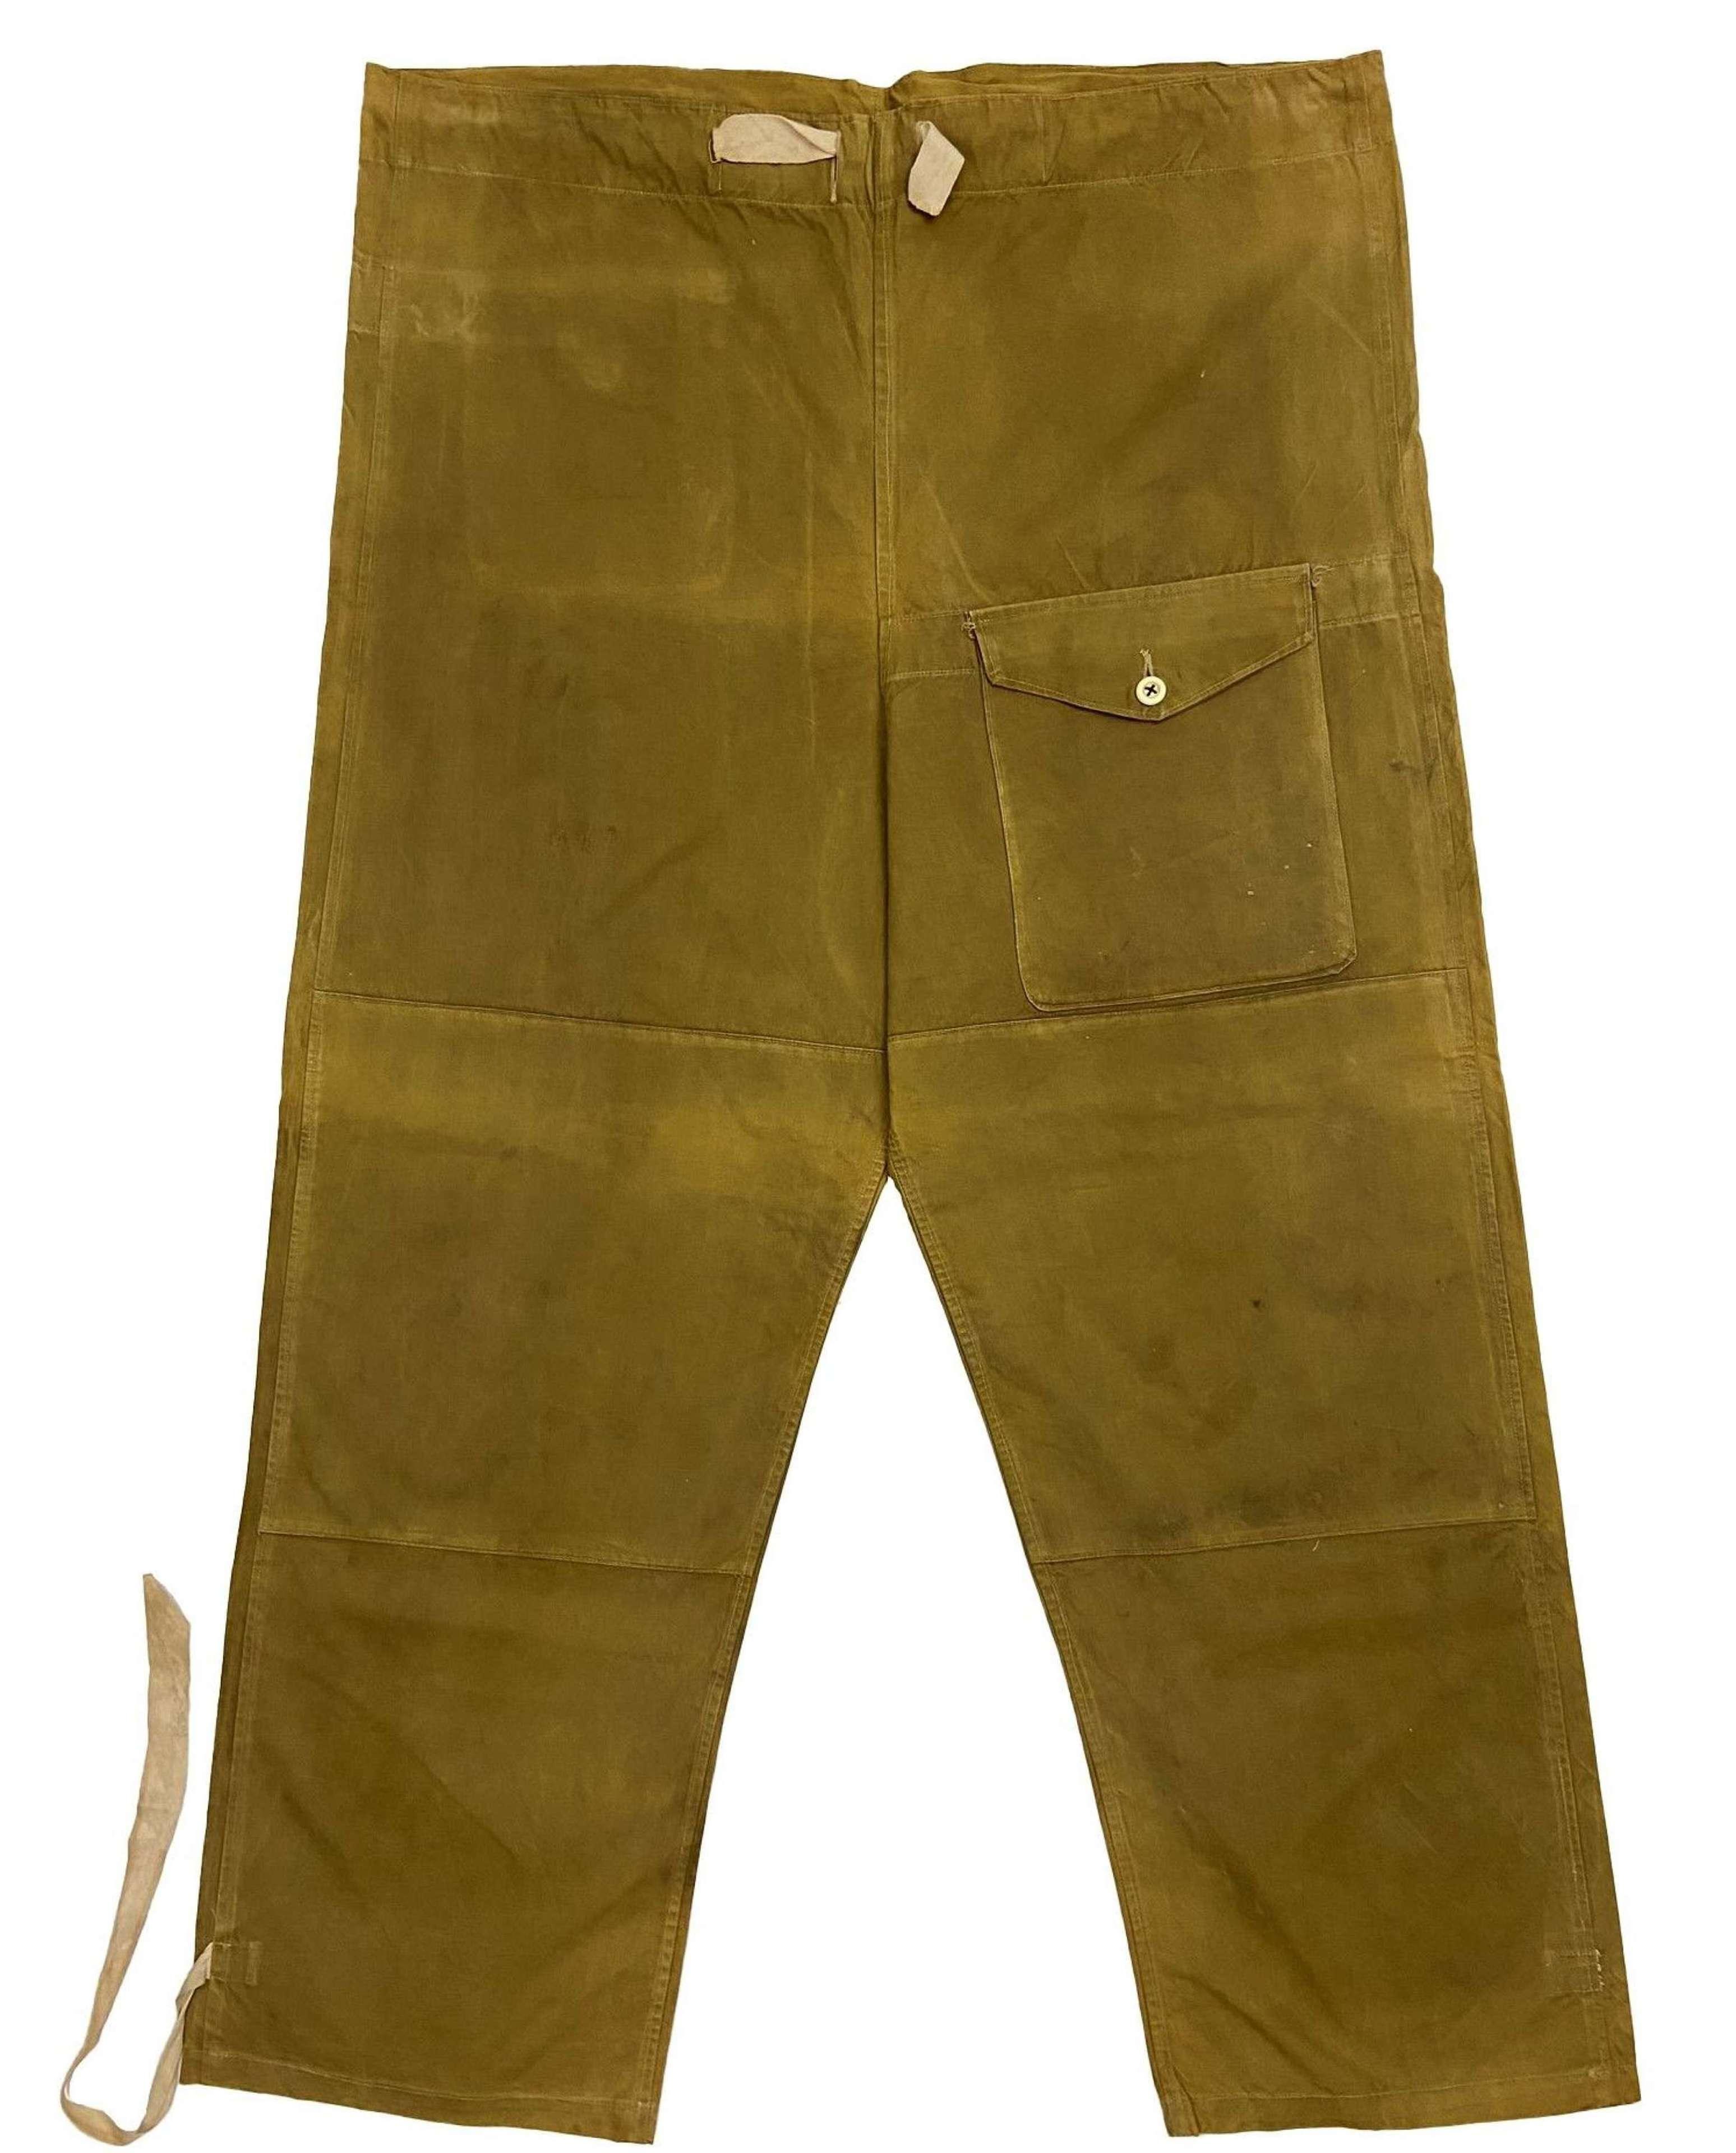 Scarce Original WW2 Trousers Windproof (Labrador Type) - Size 3